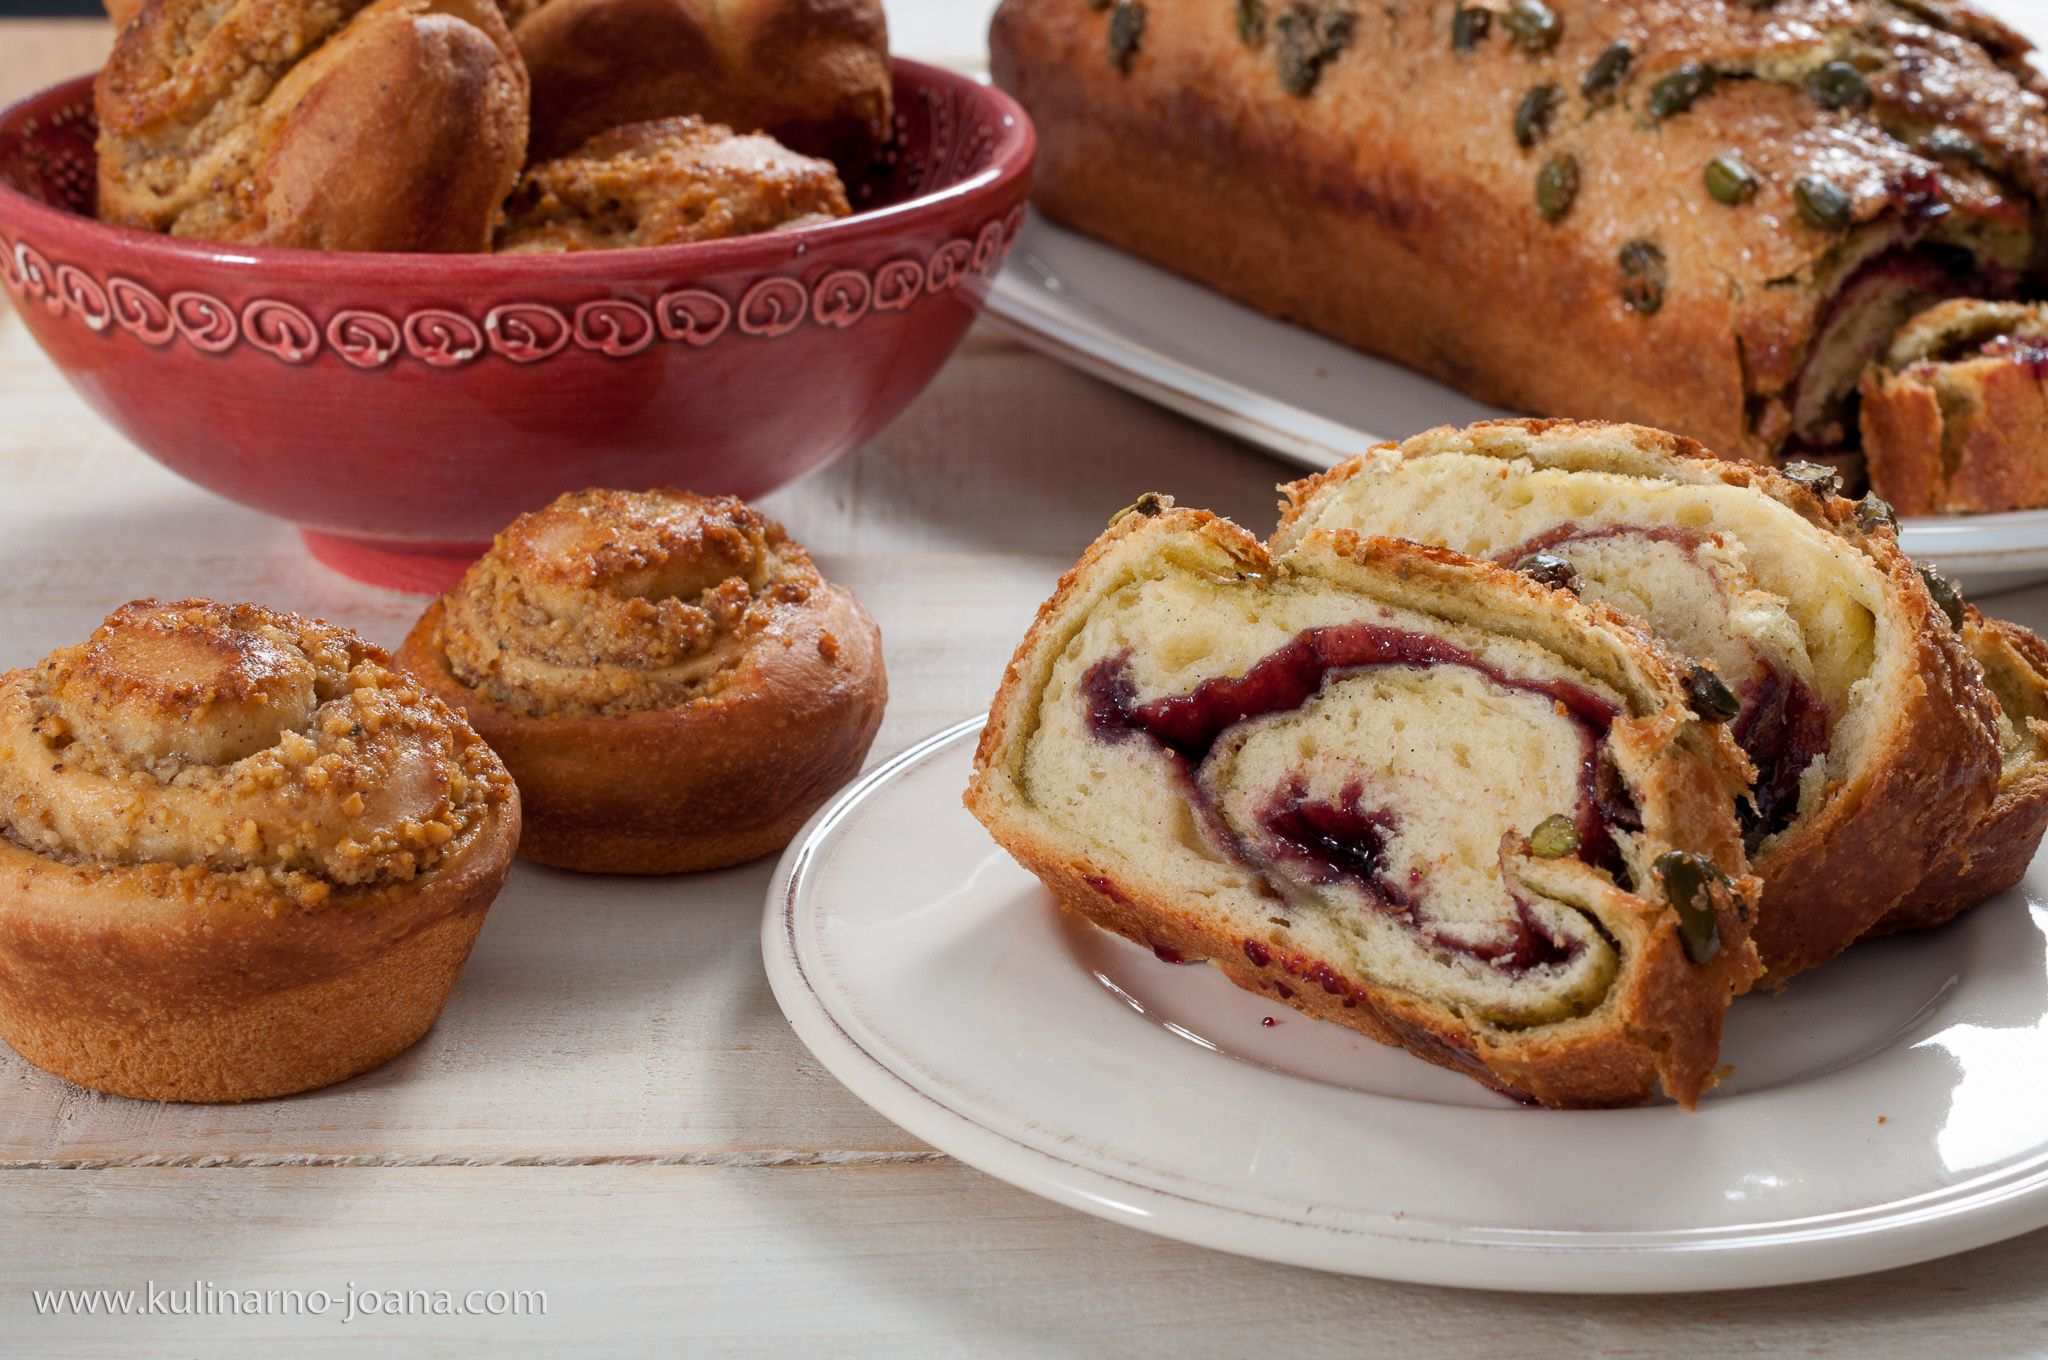 Kozunak S Kvas I Dva Plnezha Food Recipes Muffins Bread